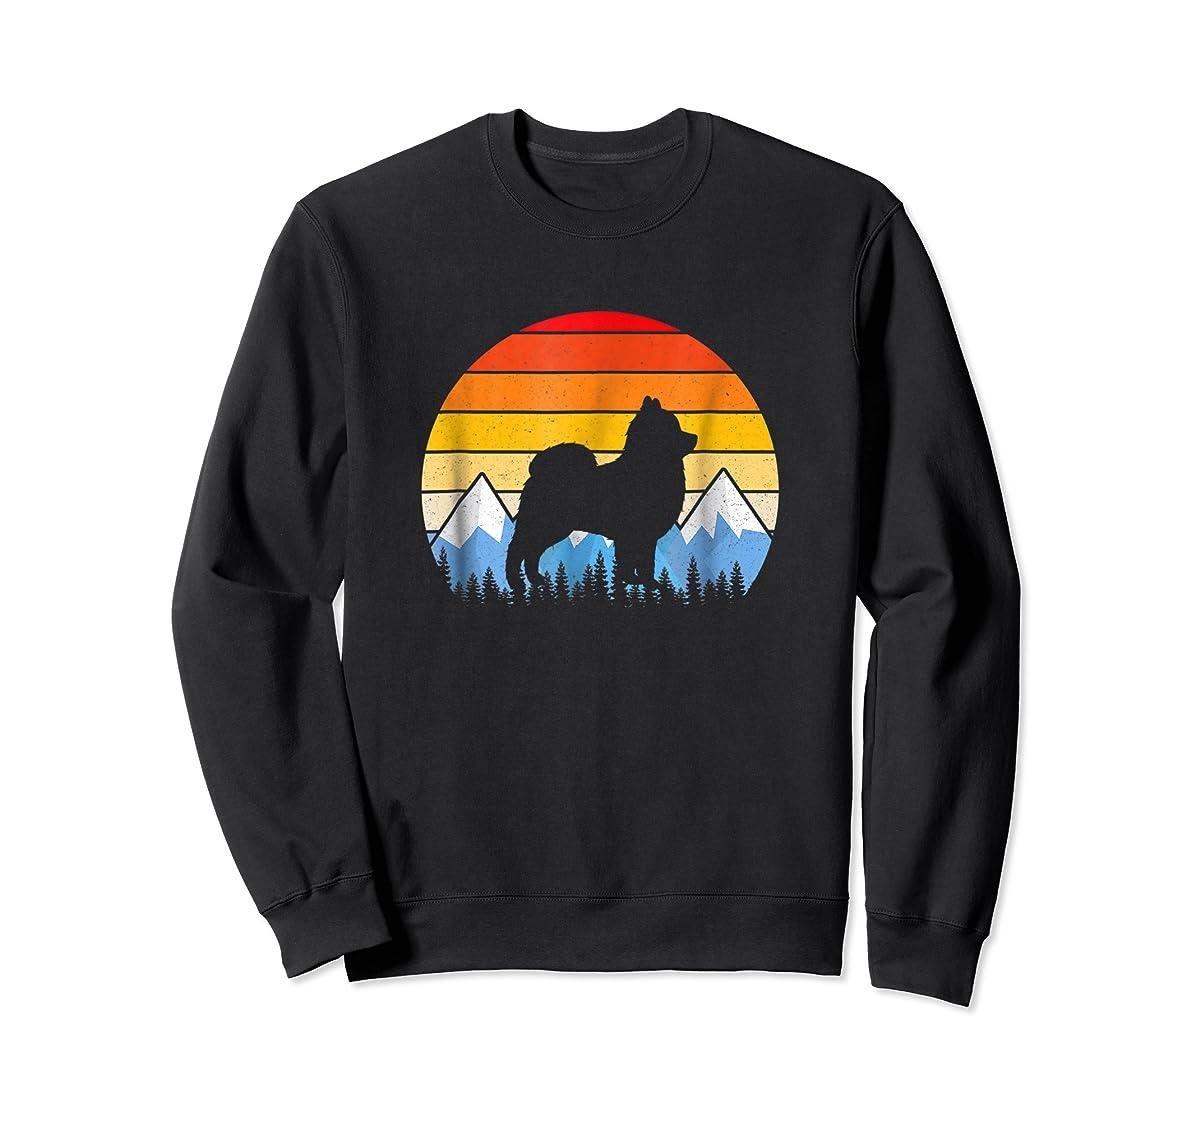 Vintage Retro Pomeranian Lovers Gifts Pomeranian T Shirts-Sweatshirt-Black